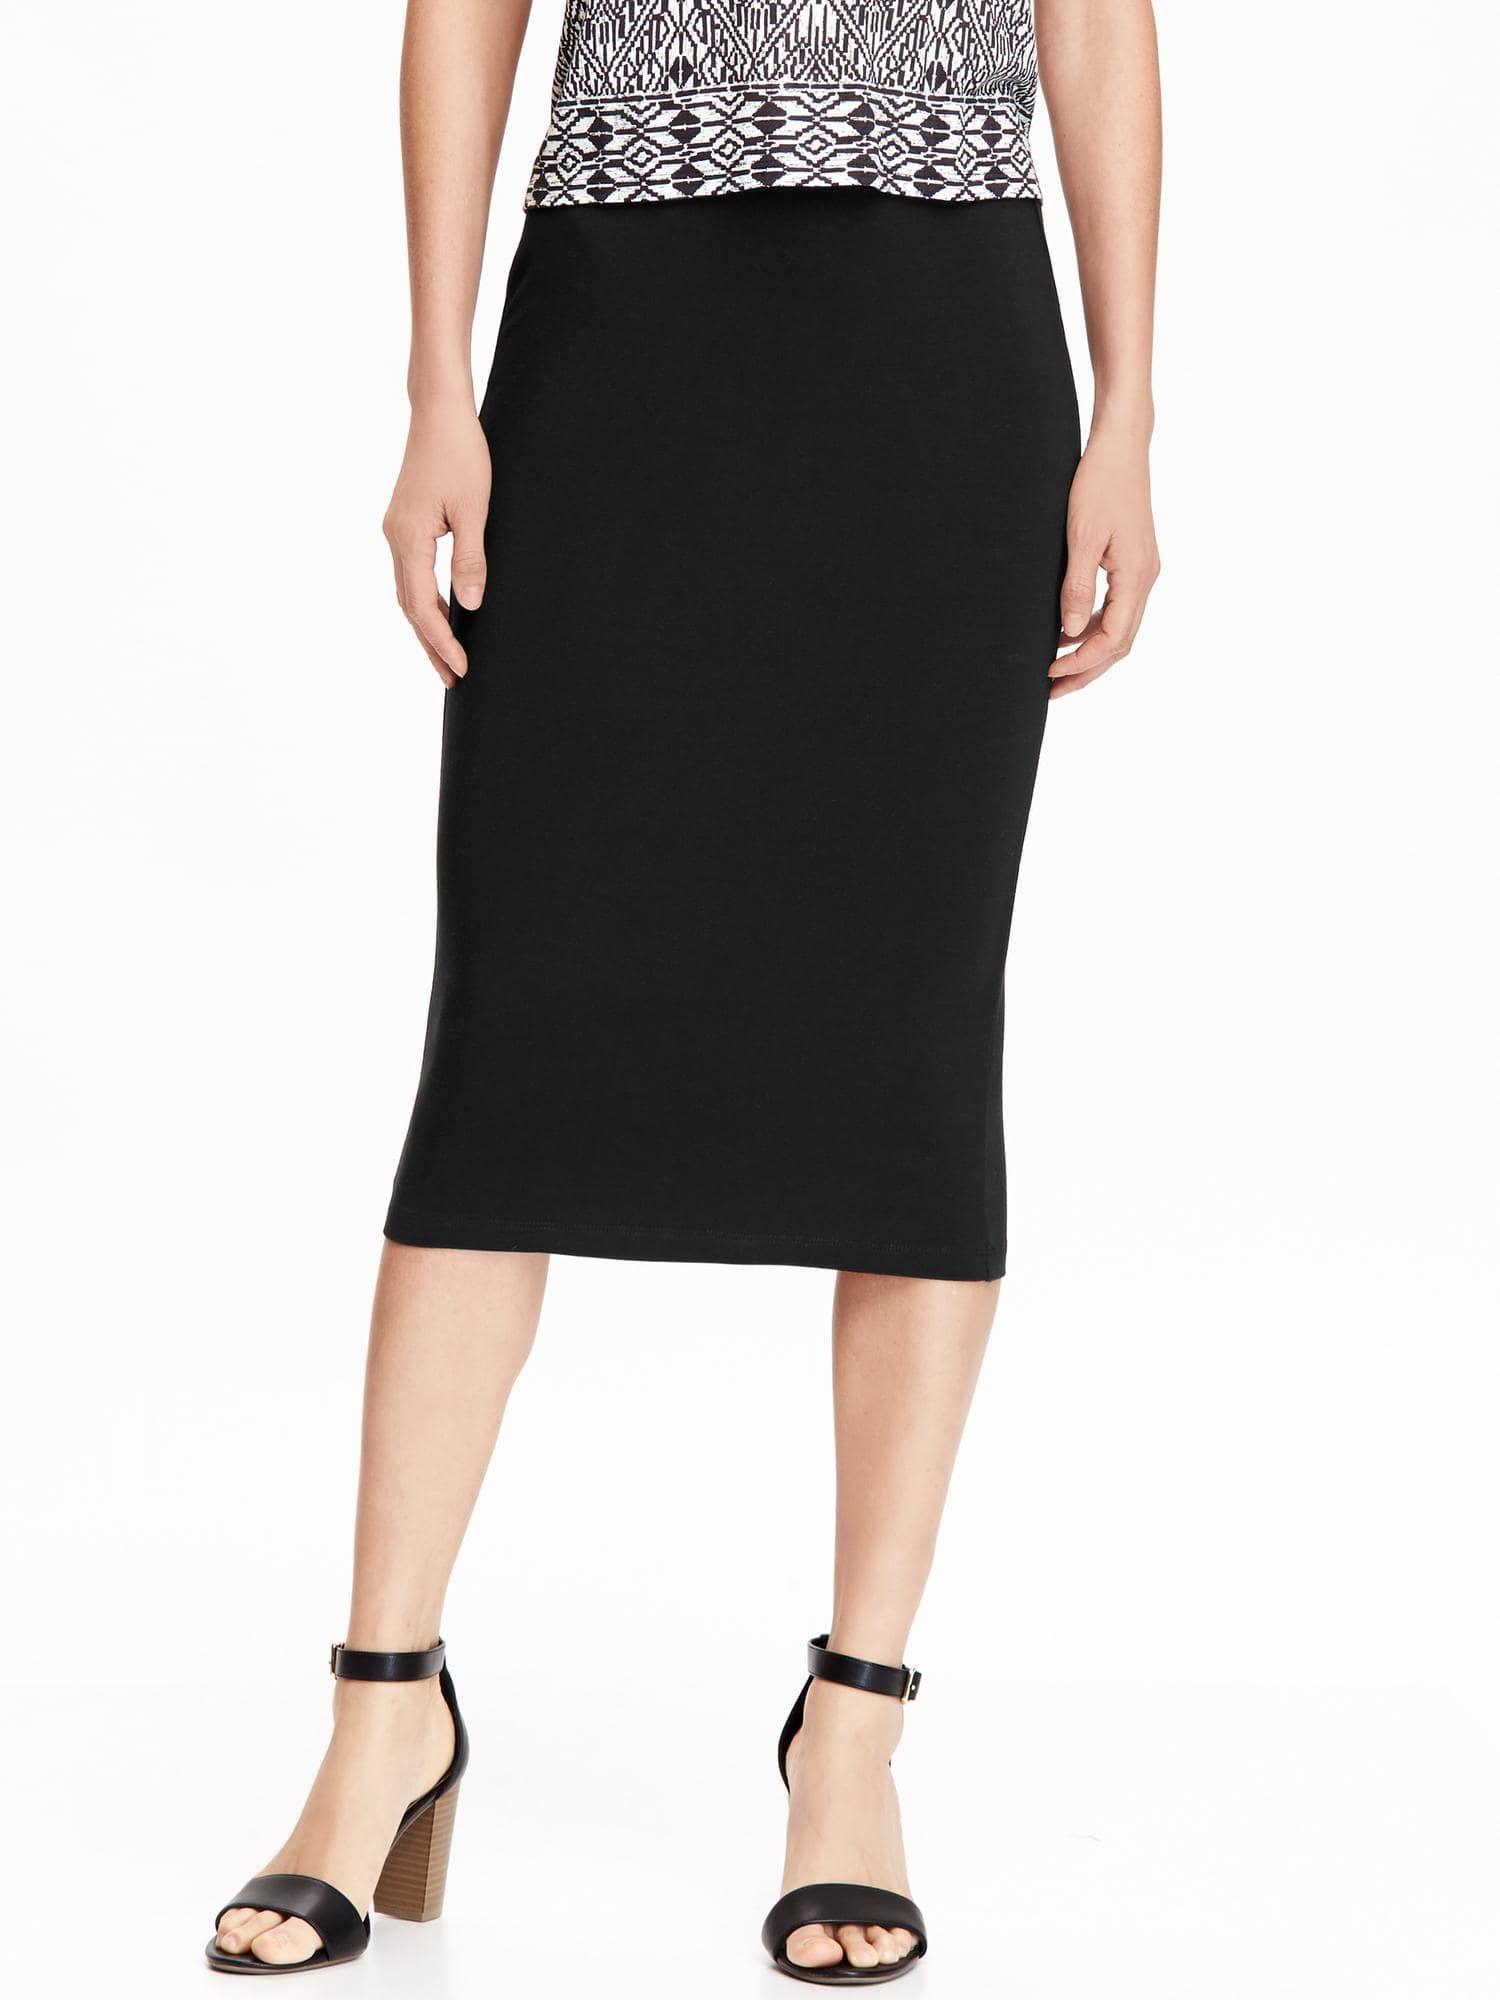 fb76a3e352 Jersey Pencil Midi Skirt for Women in 2019 | Clothing | Black midi ...